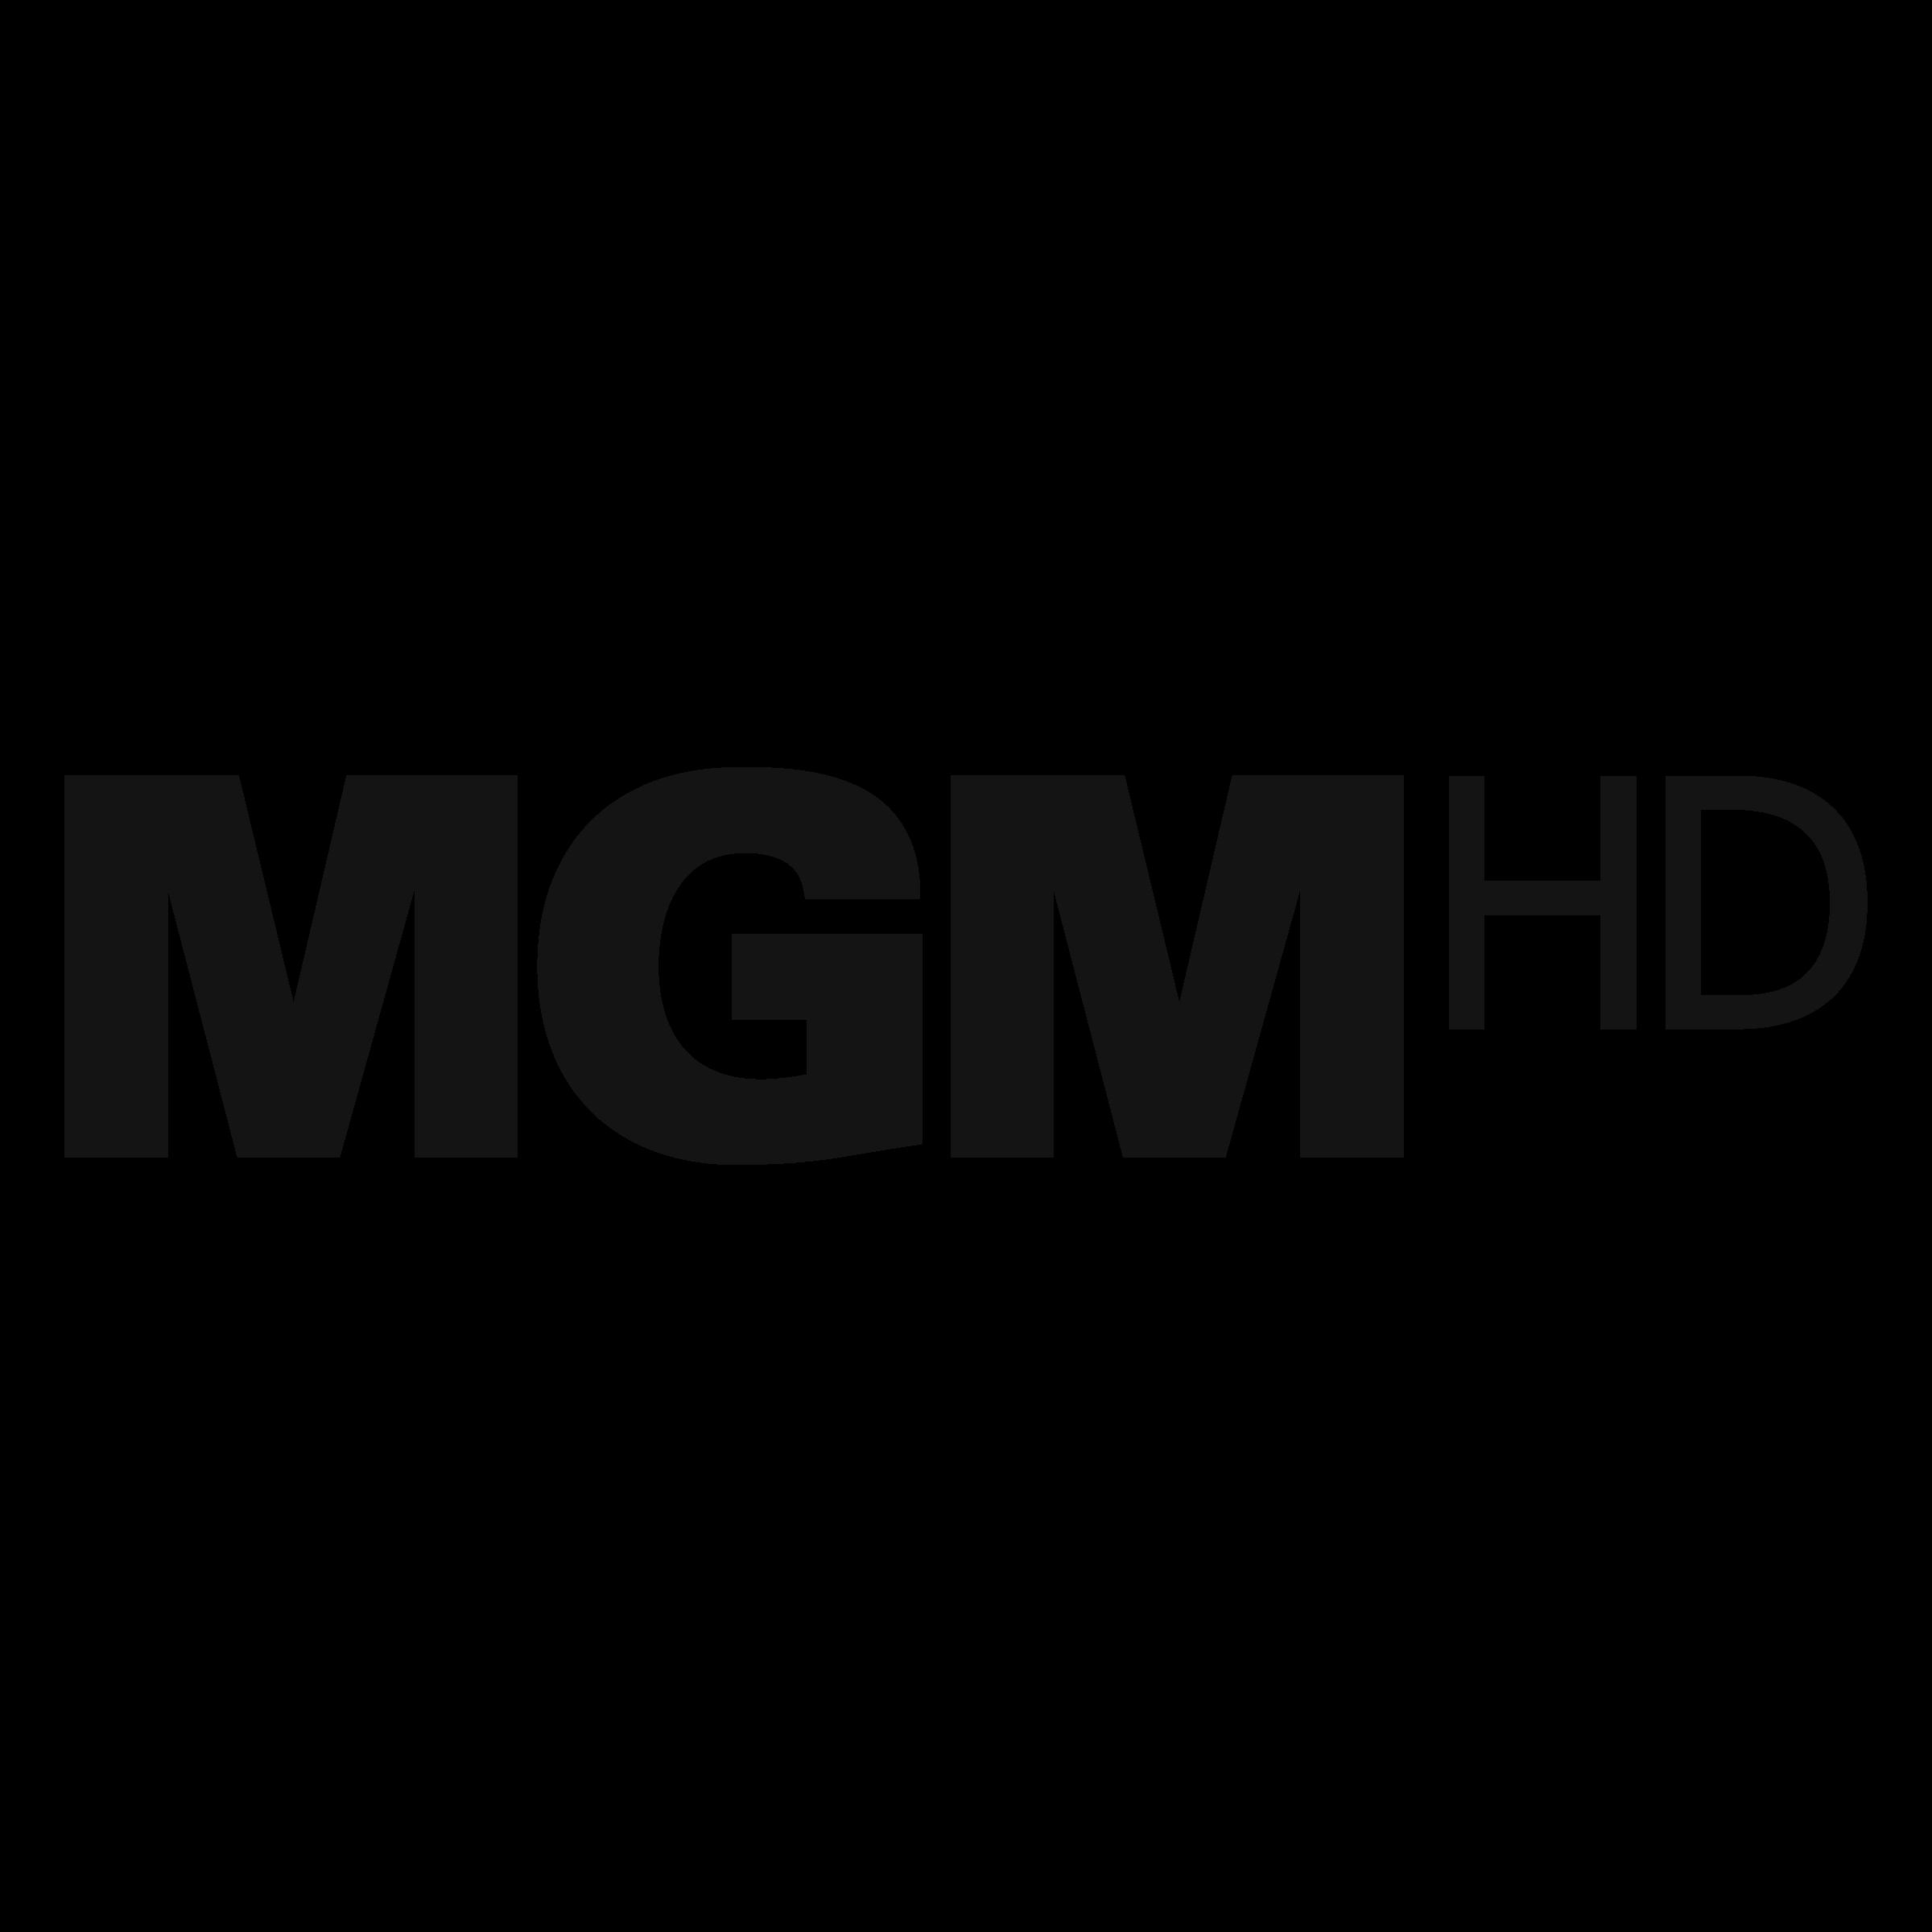 mgm hdtv - tv listings guide